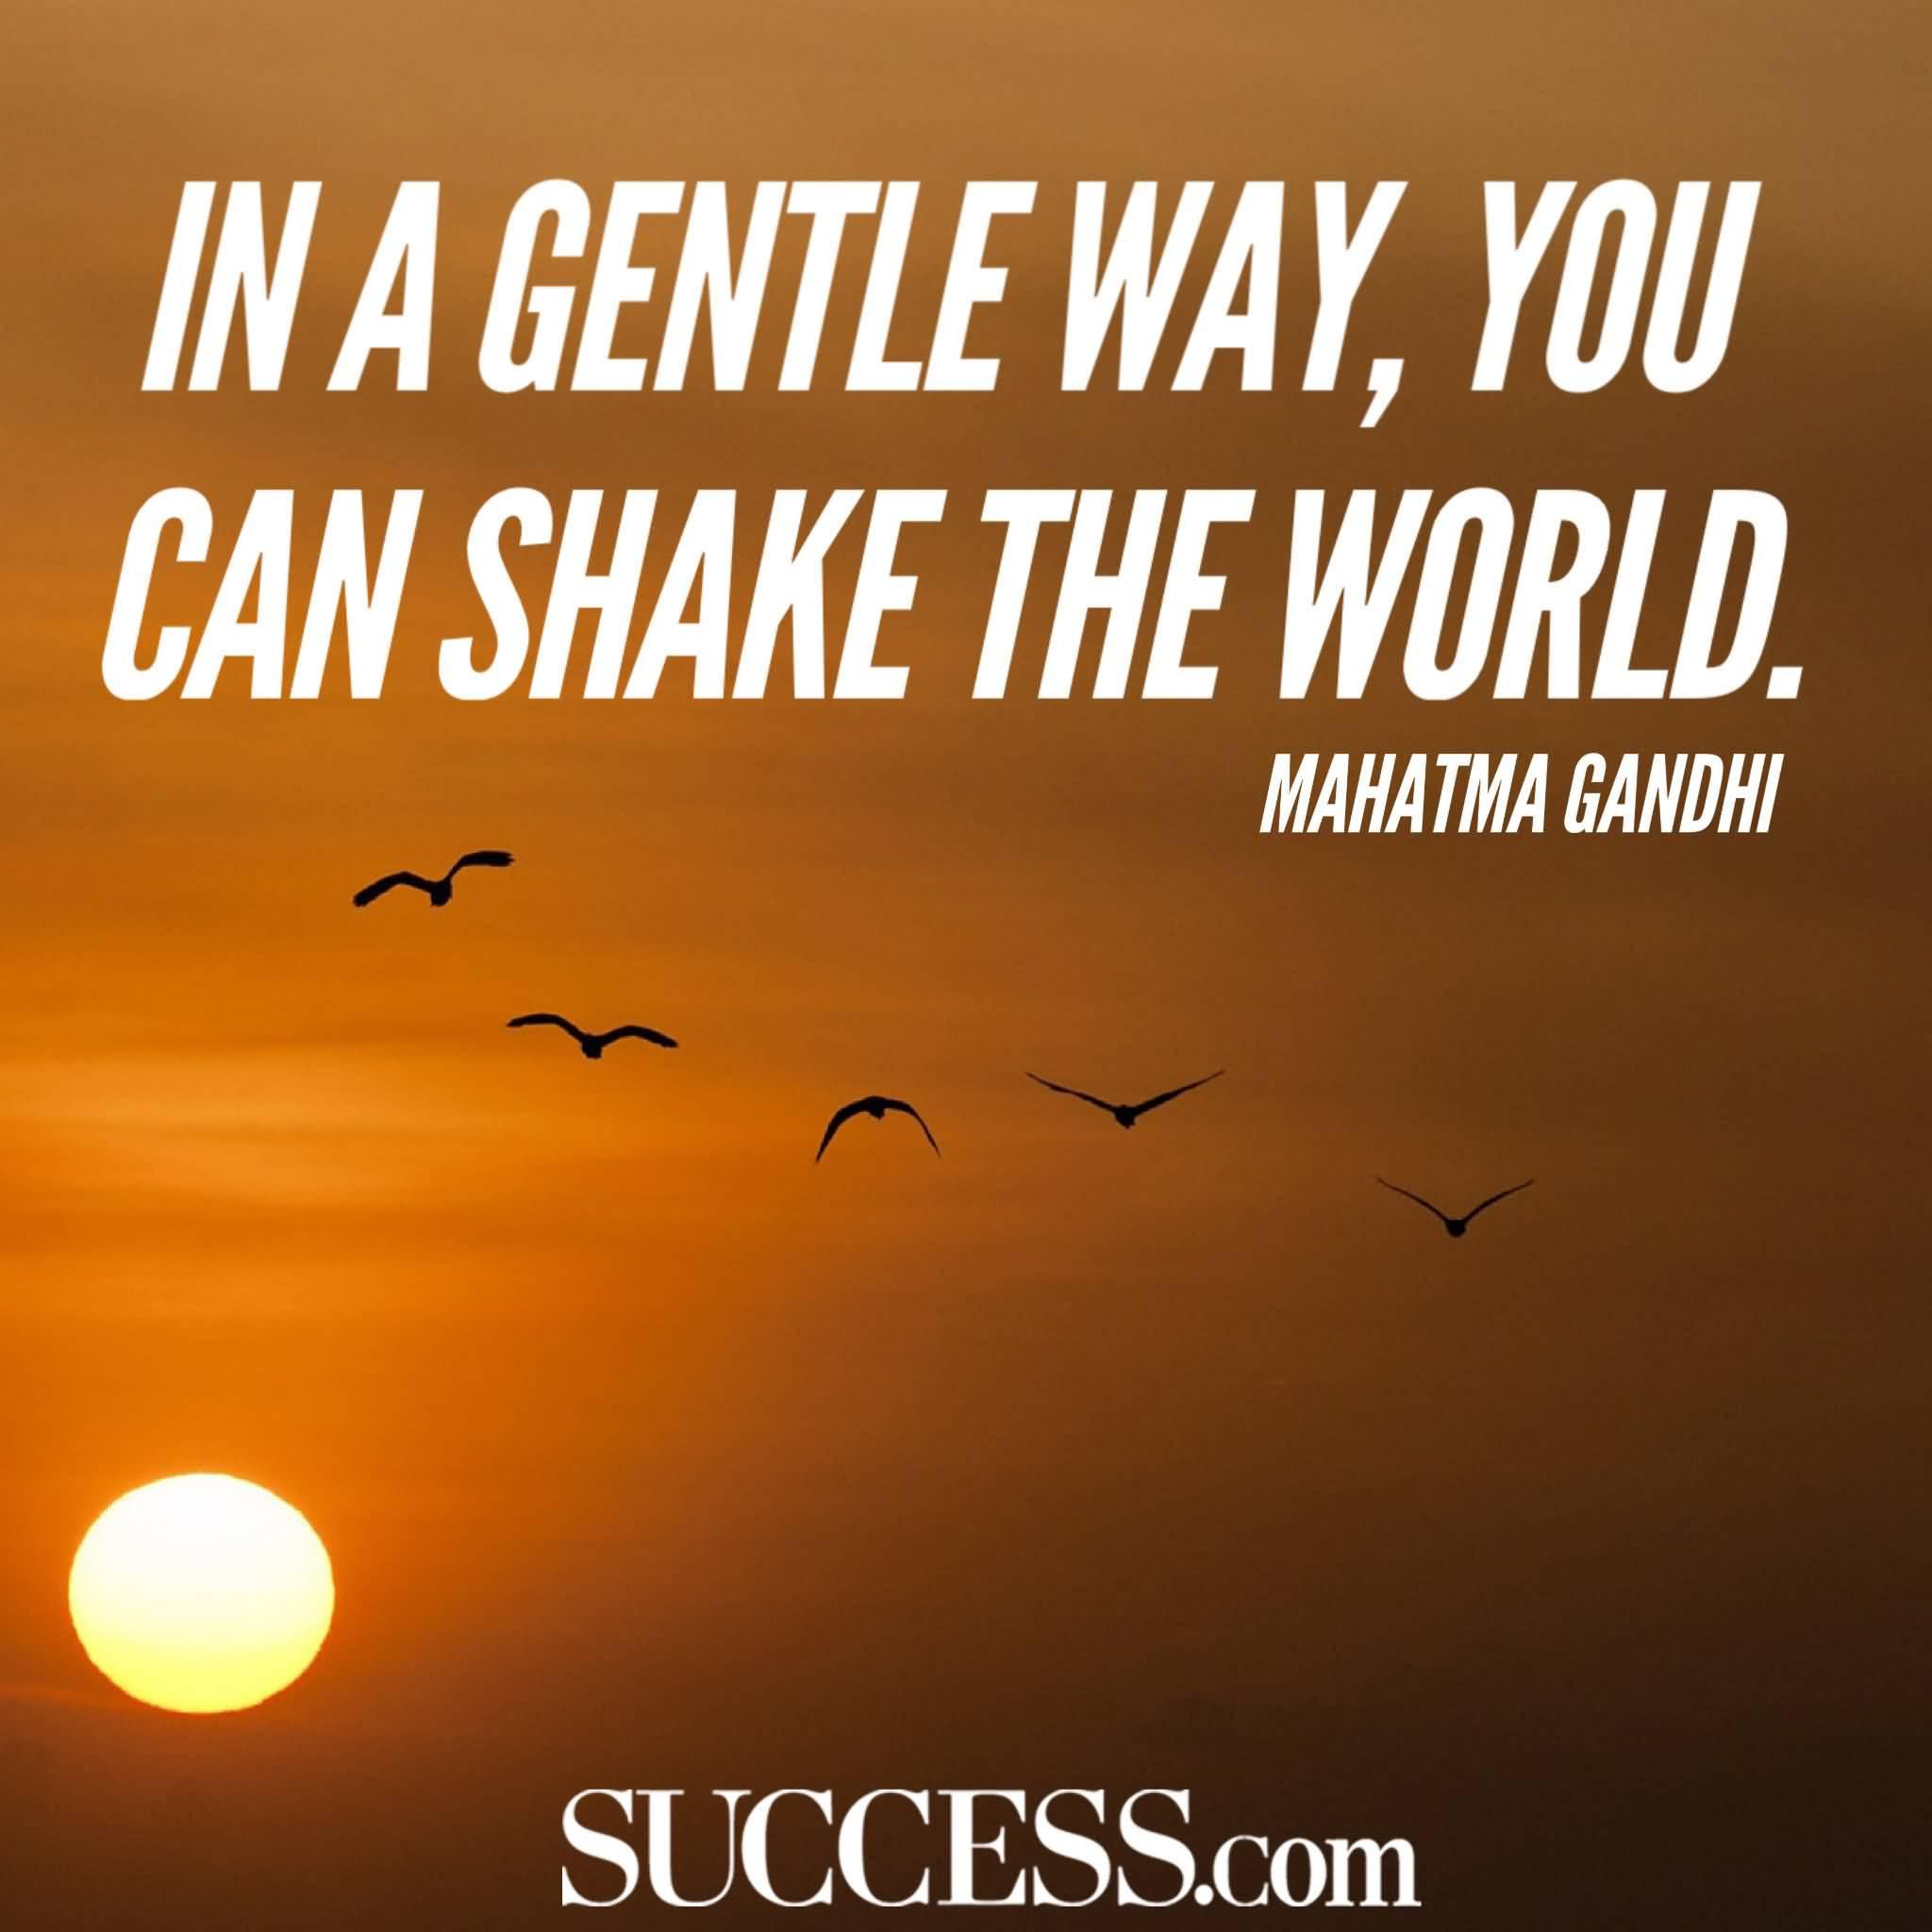 Inspirational Quotes Image Photo Meme 16